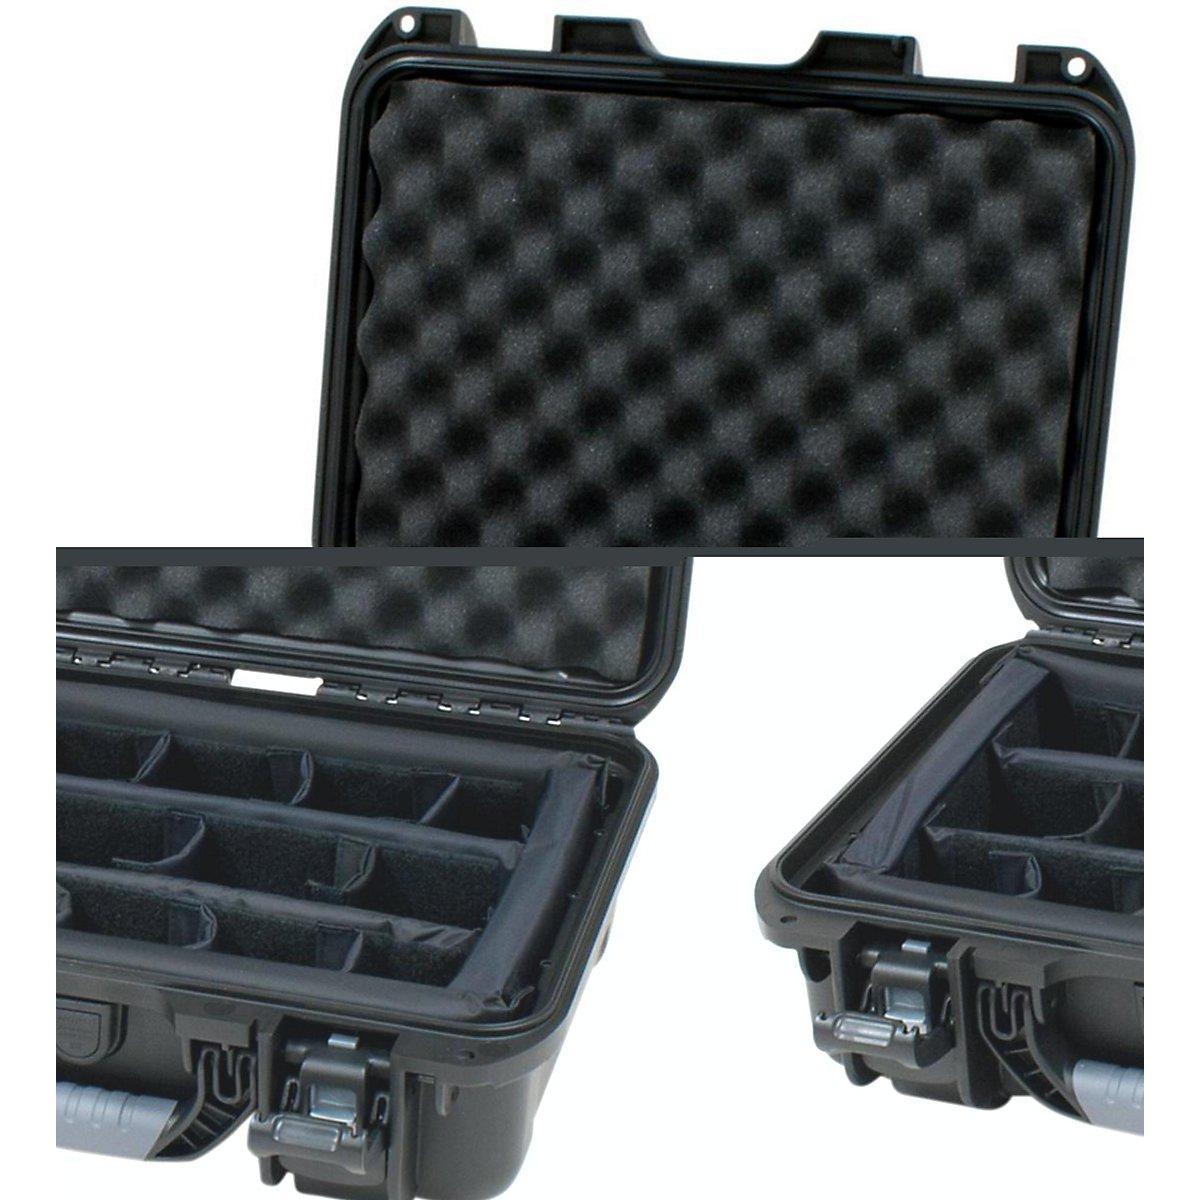 Gator Cases GU-1510-06-WPDV Titan Series Waterproof Equipment with Divider Insert 15'' x 10.5'' x 6.2''